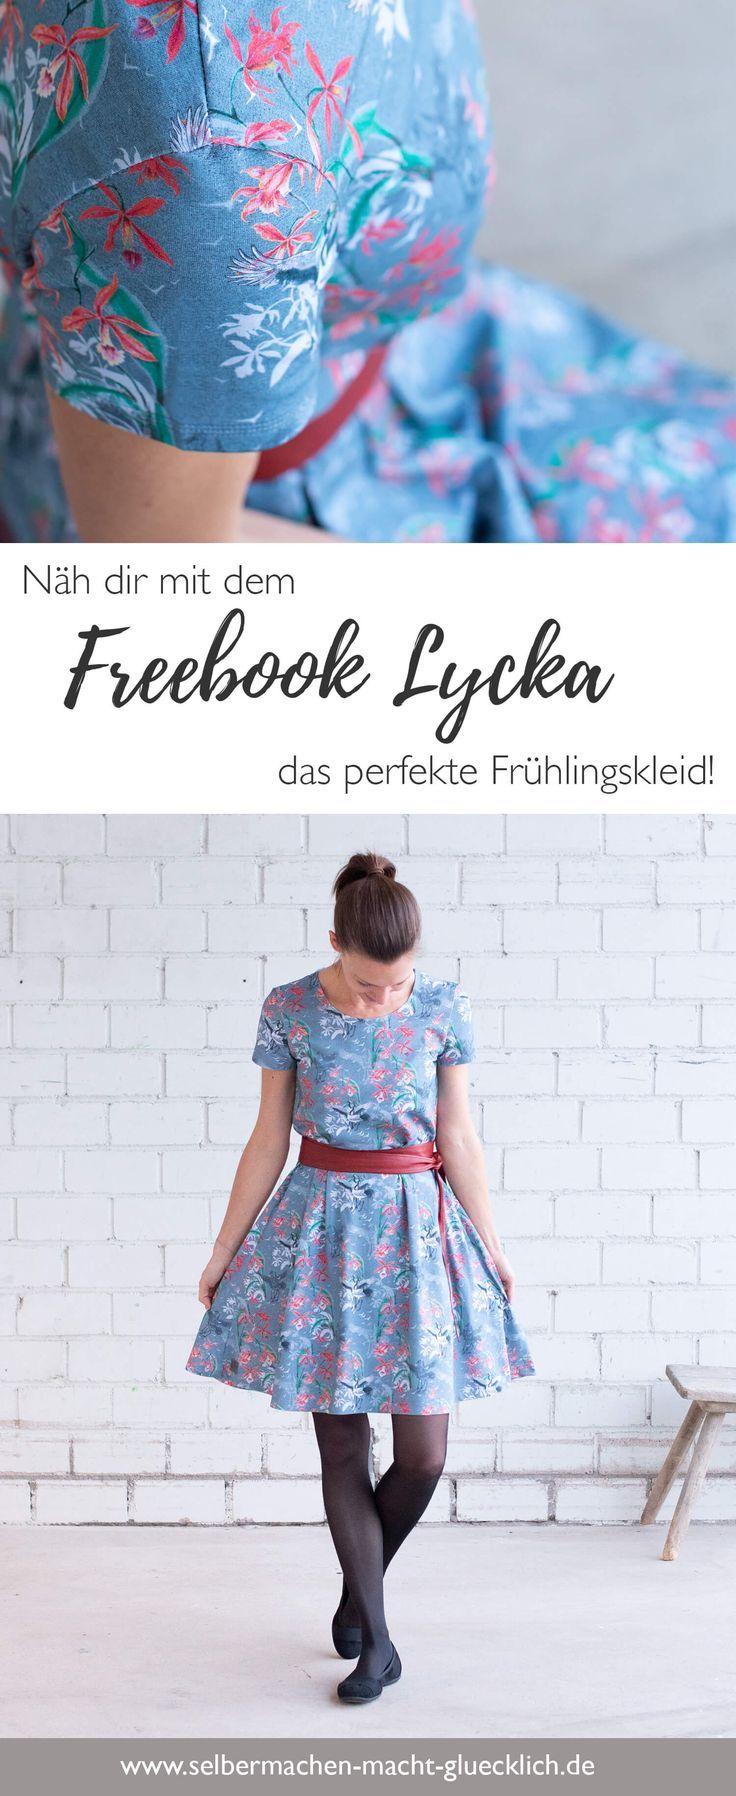 Freebook Lycka pour la robe de printemps parfaite!   – Nähen: kostenlose Nähanleitungen & Freebooks